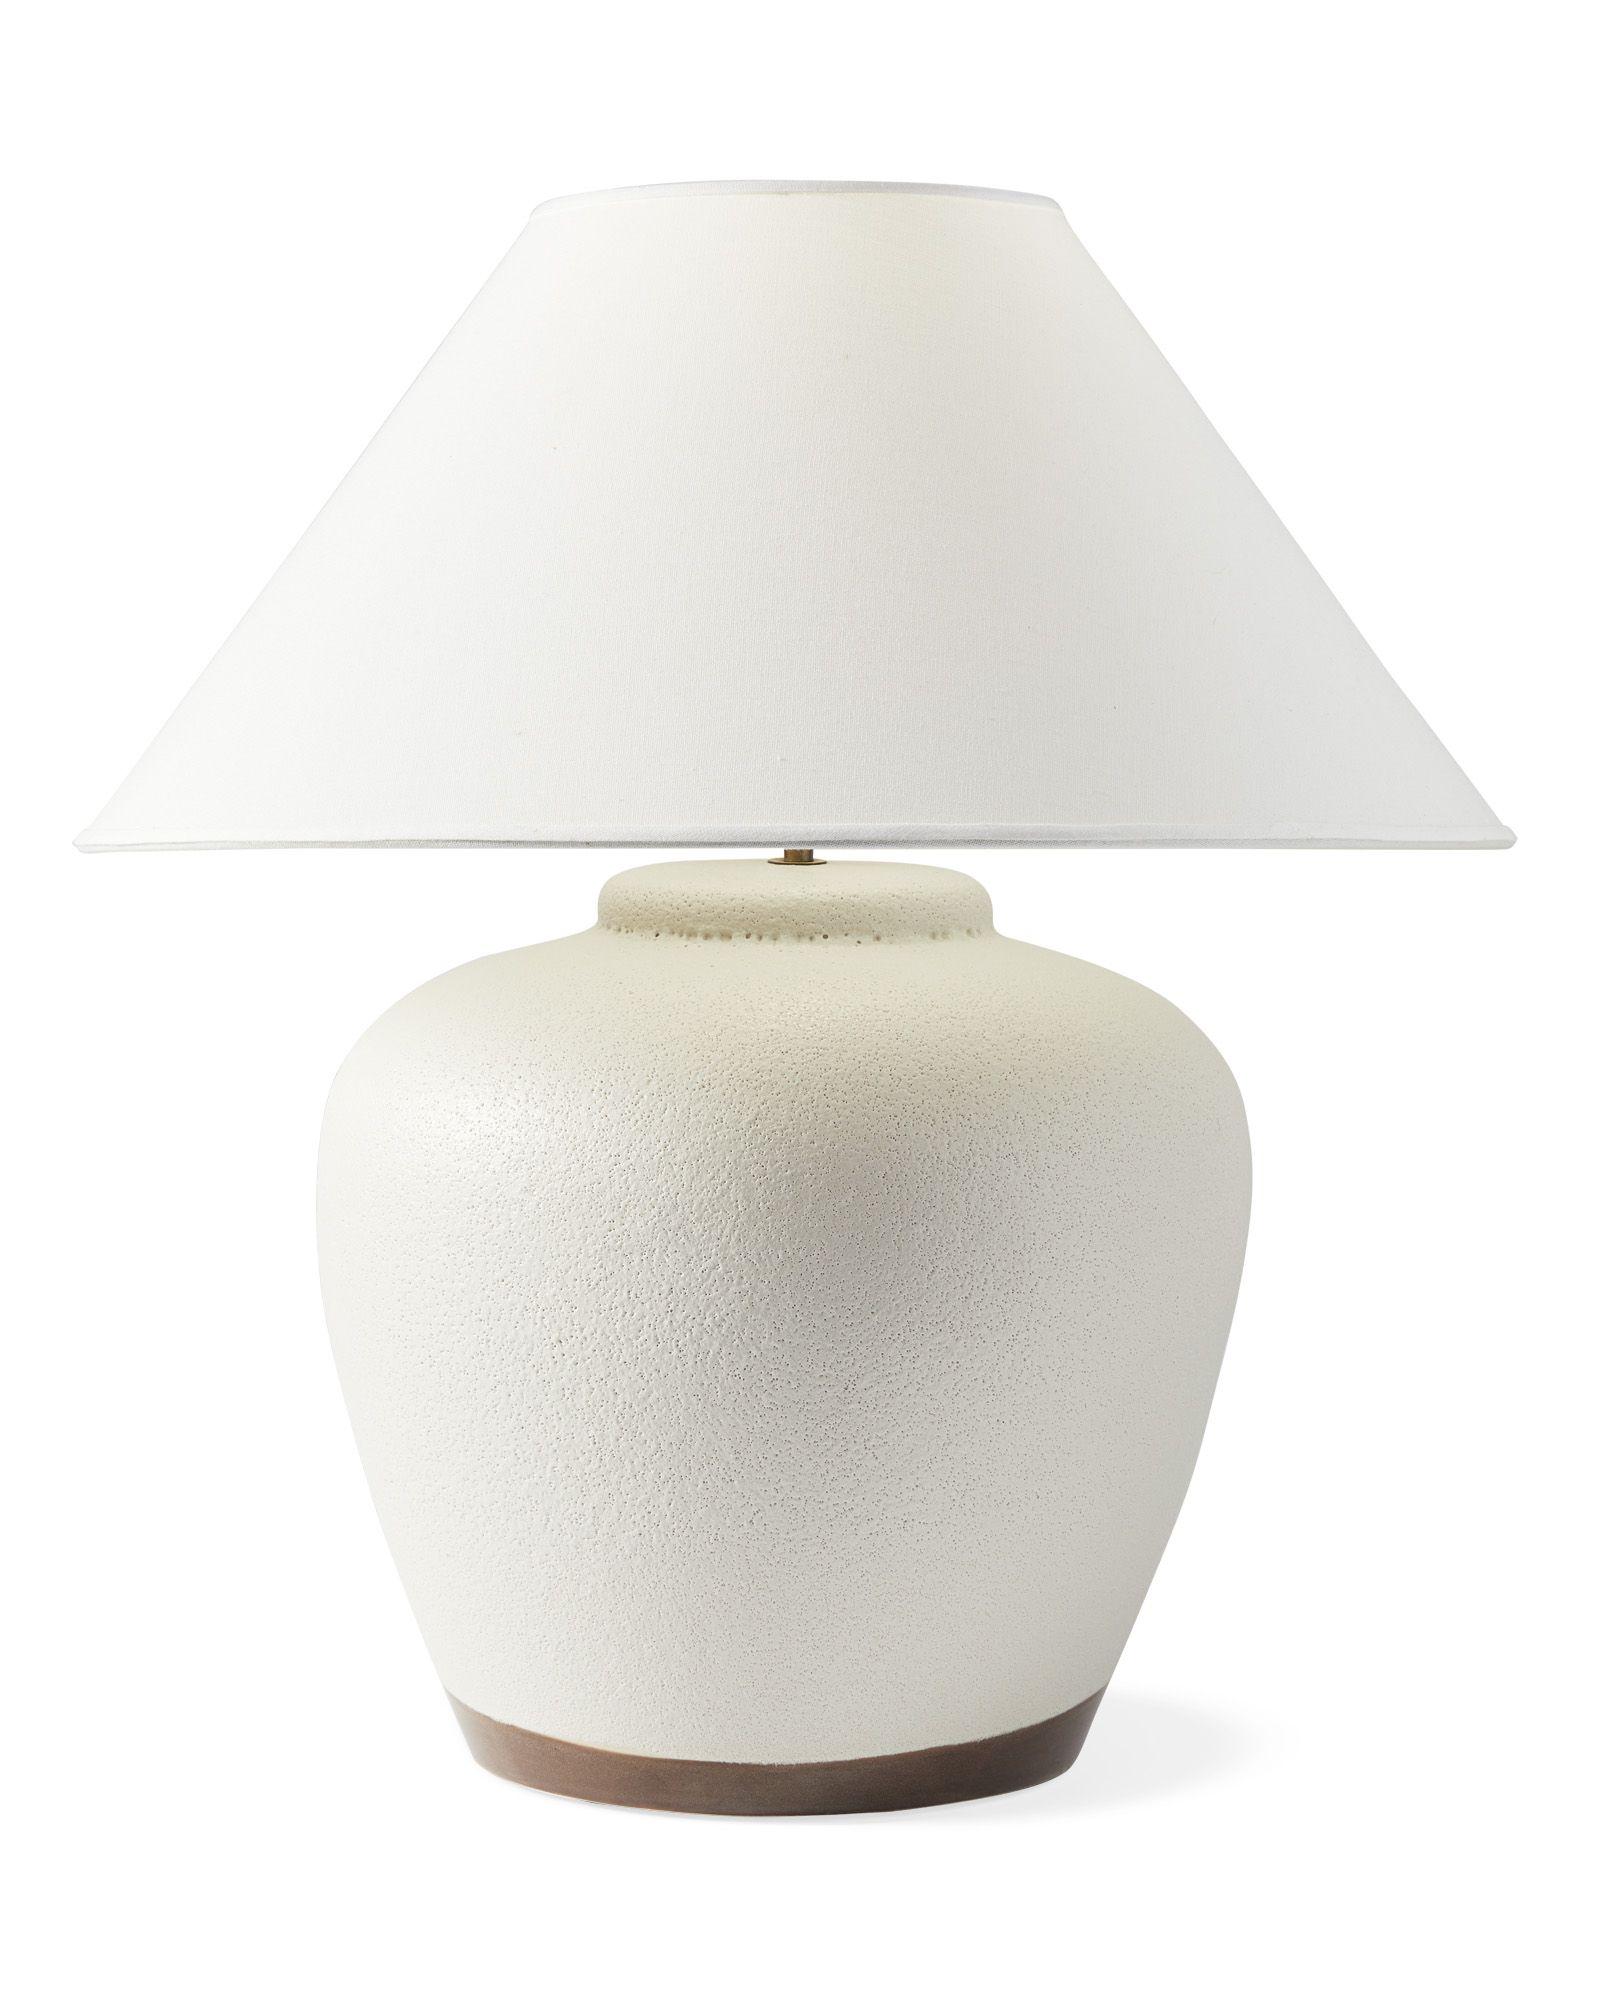 Hastings Table Lamp Table Lamp Lamp Large Table Lamps